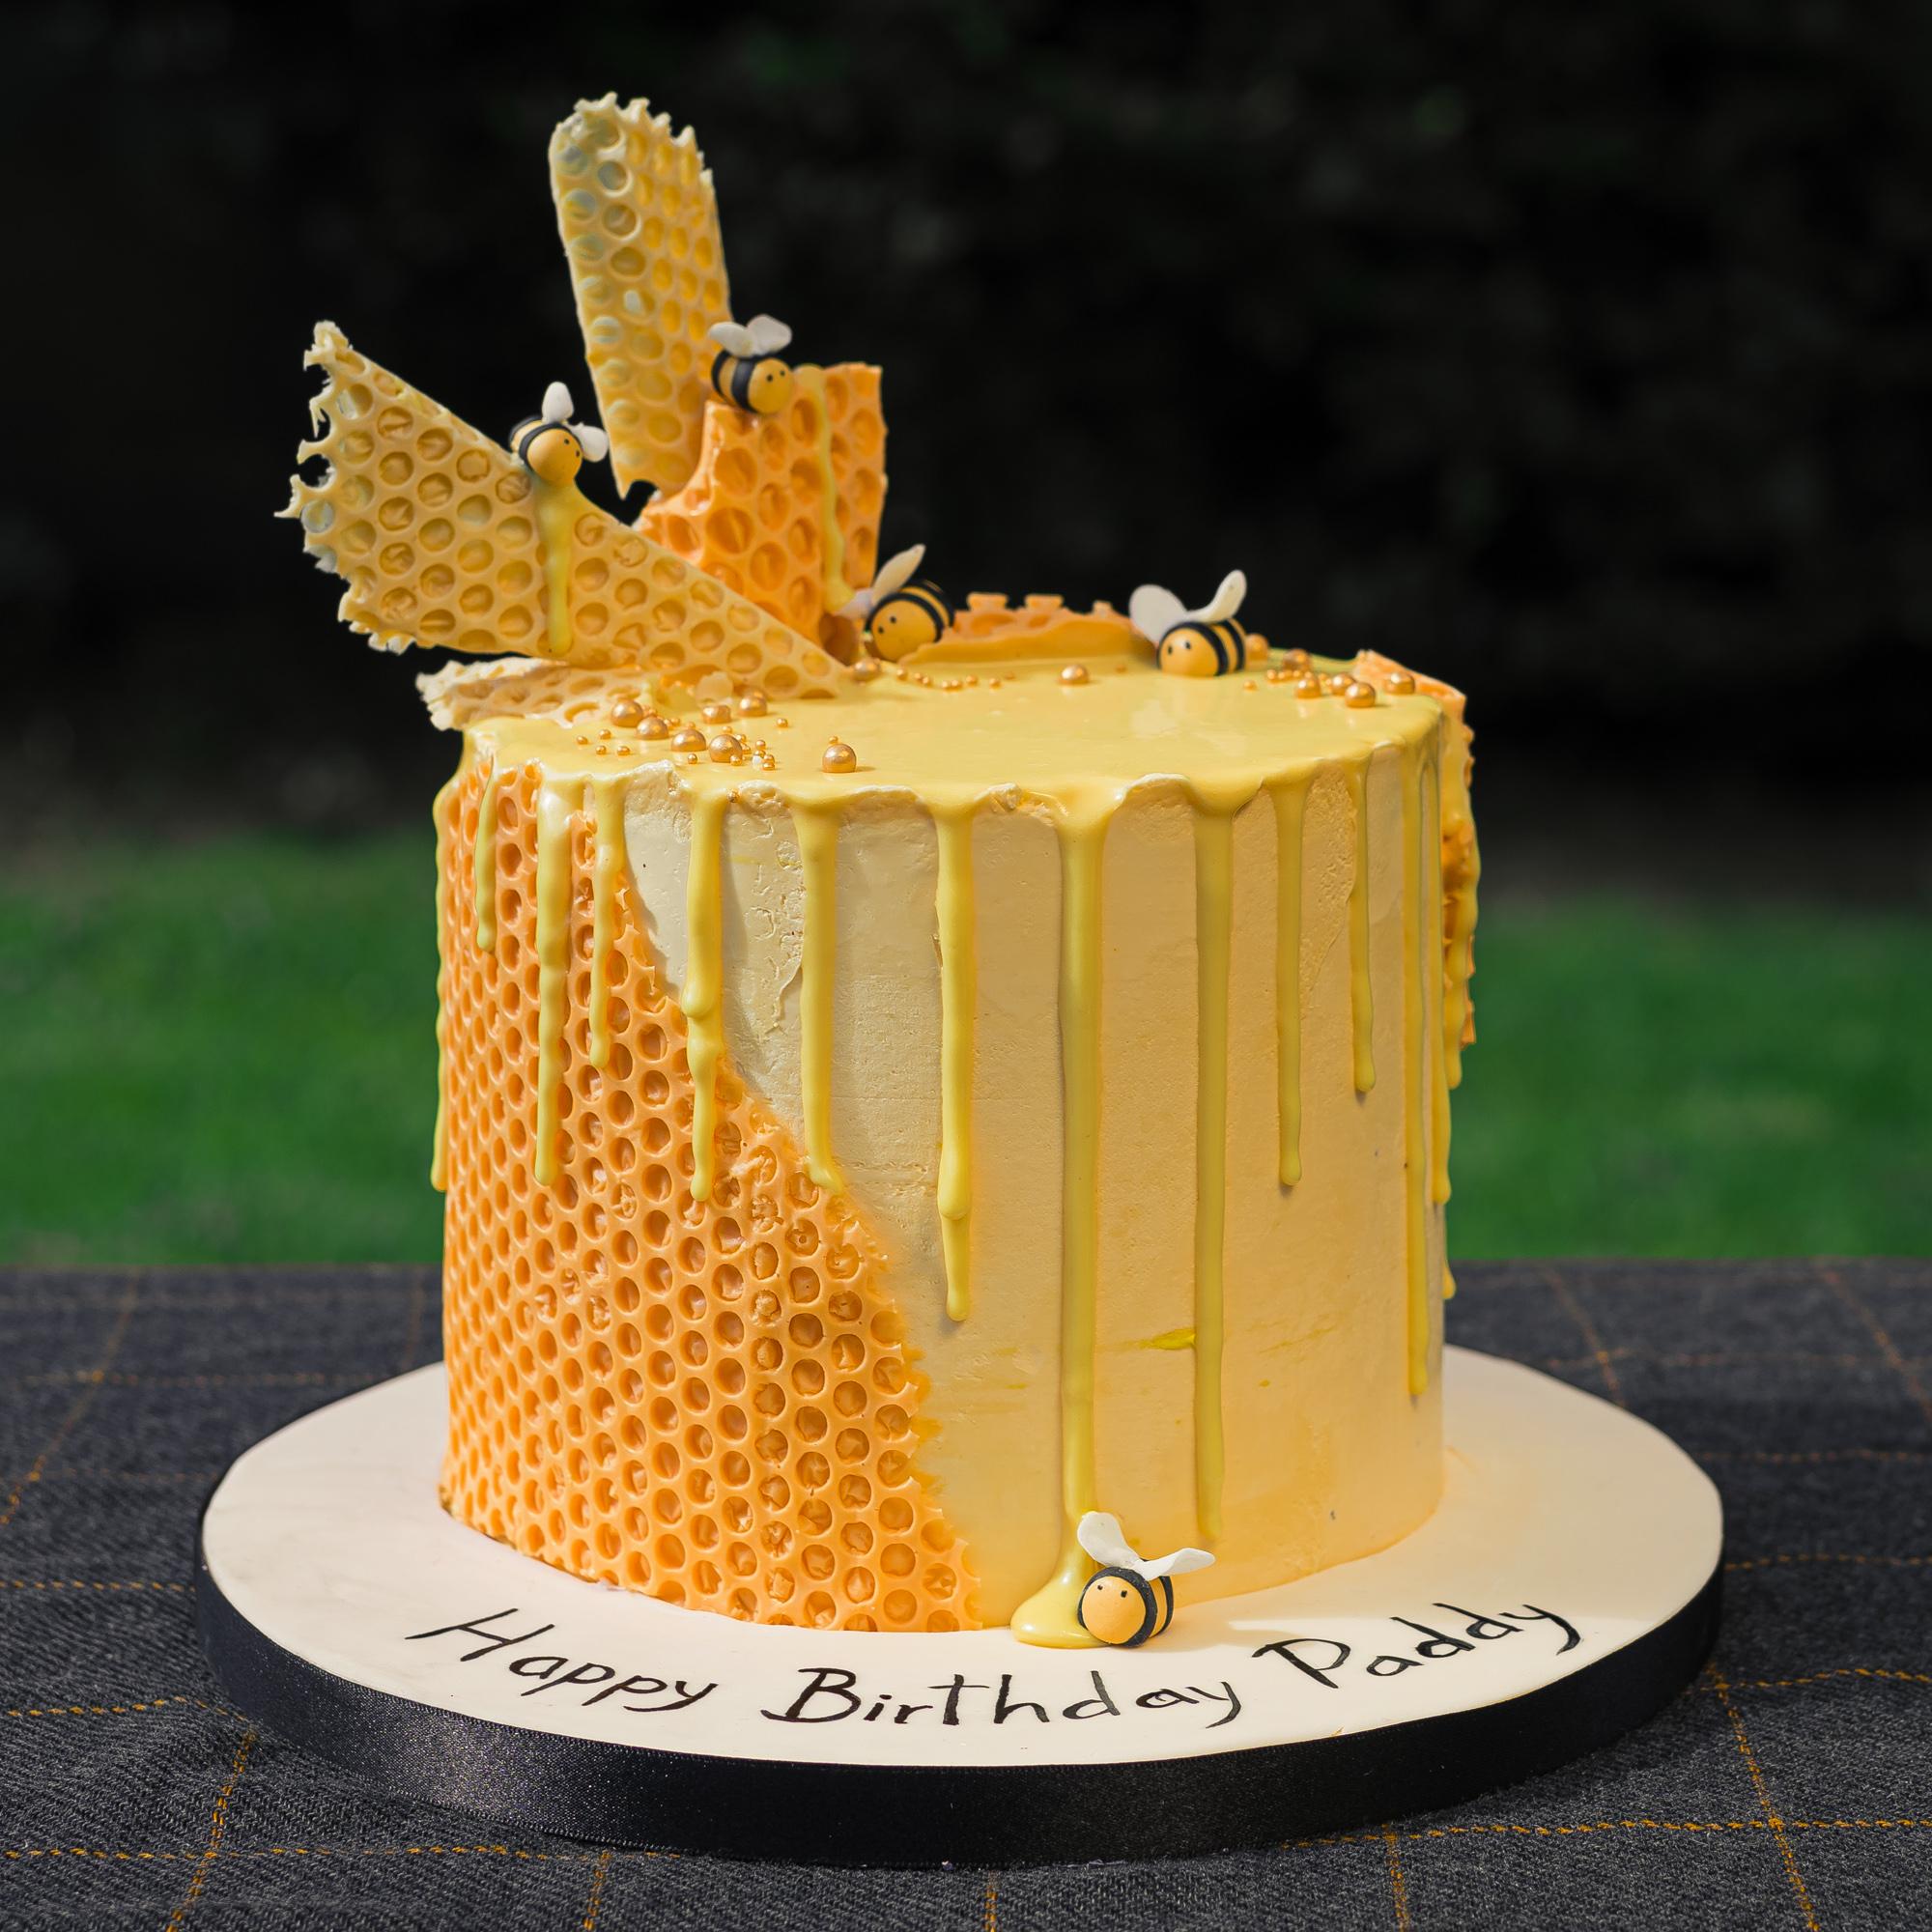 Sensational Honey Bee Birthday Cake Gabi Bakes Cakes Funny Birthday Cards Online Inifofree Goldxyz